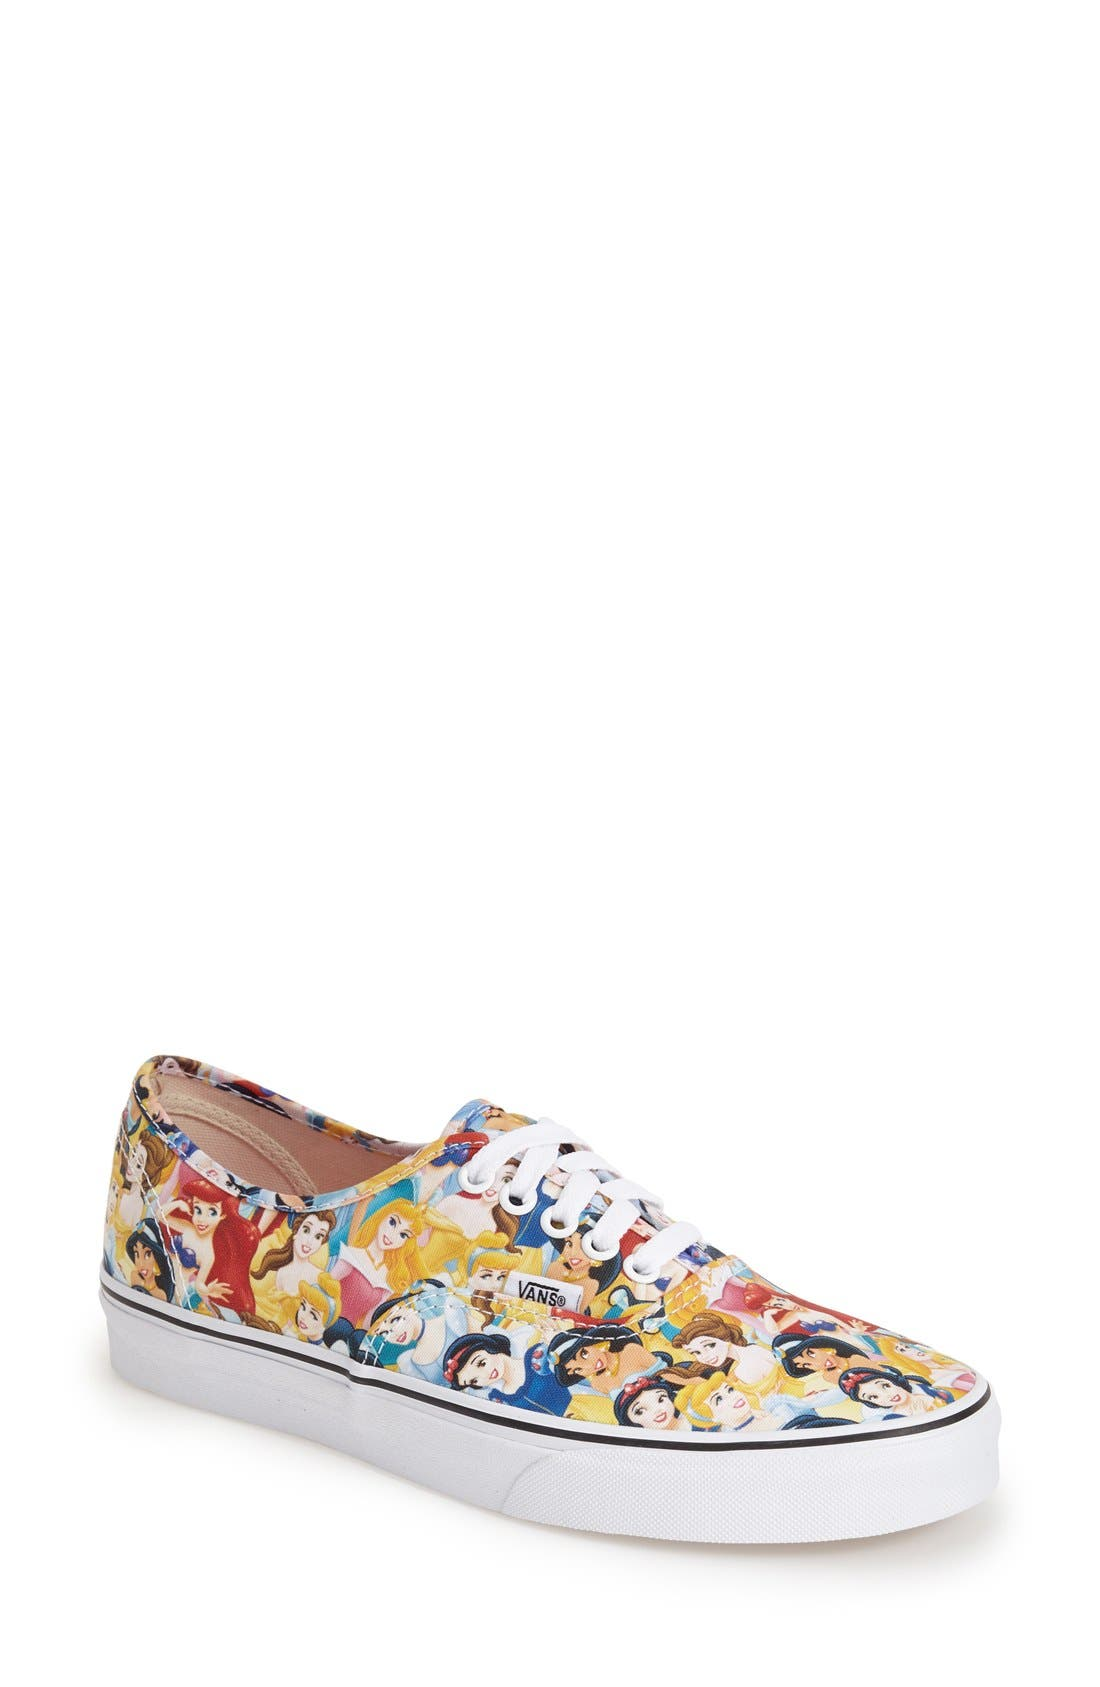 Alternate Image 1 Selected - Vans 'Authentic - Disney®' Sneaker (Women)